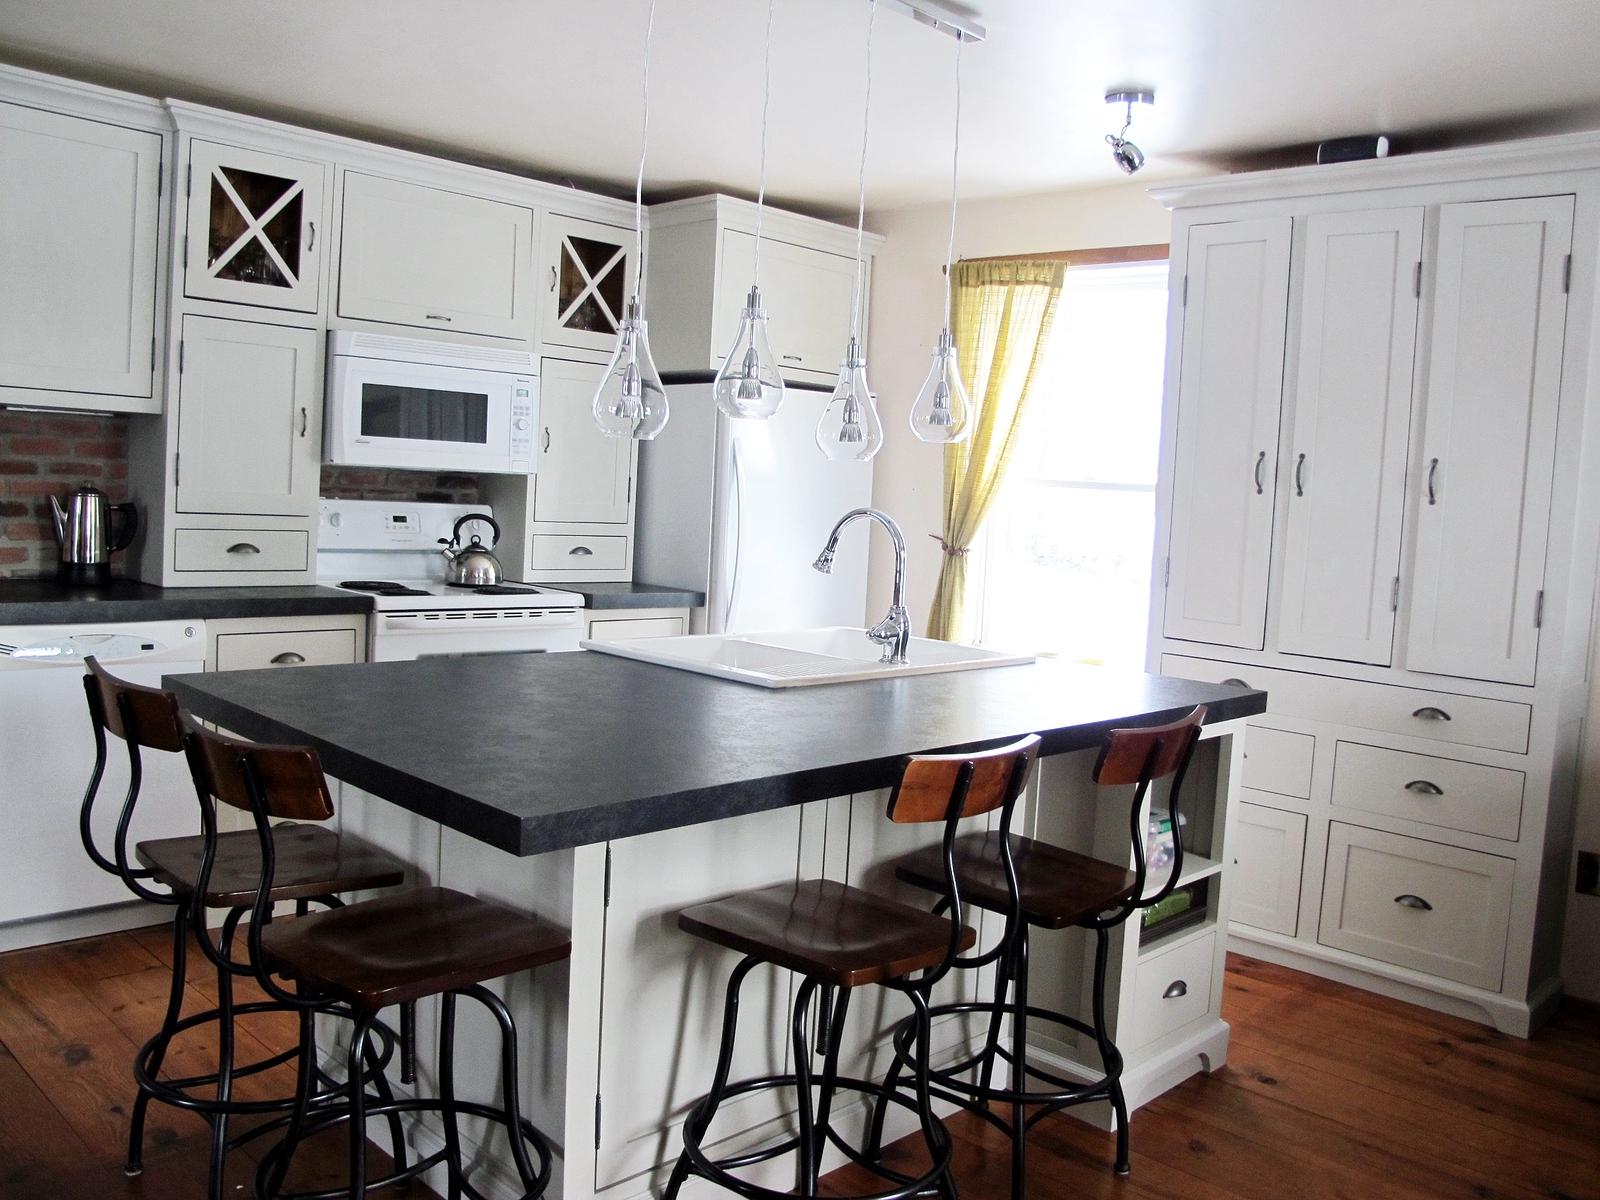 armoire cuisine ancienne bois massif joliette lanaudiere. Black Bedroom Furniture Sets. Home Design Ideas